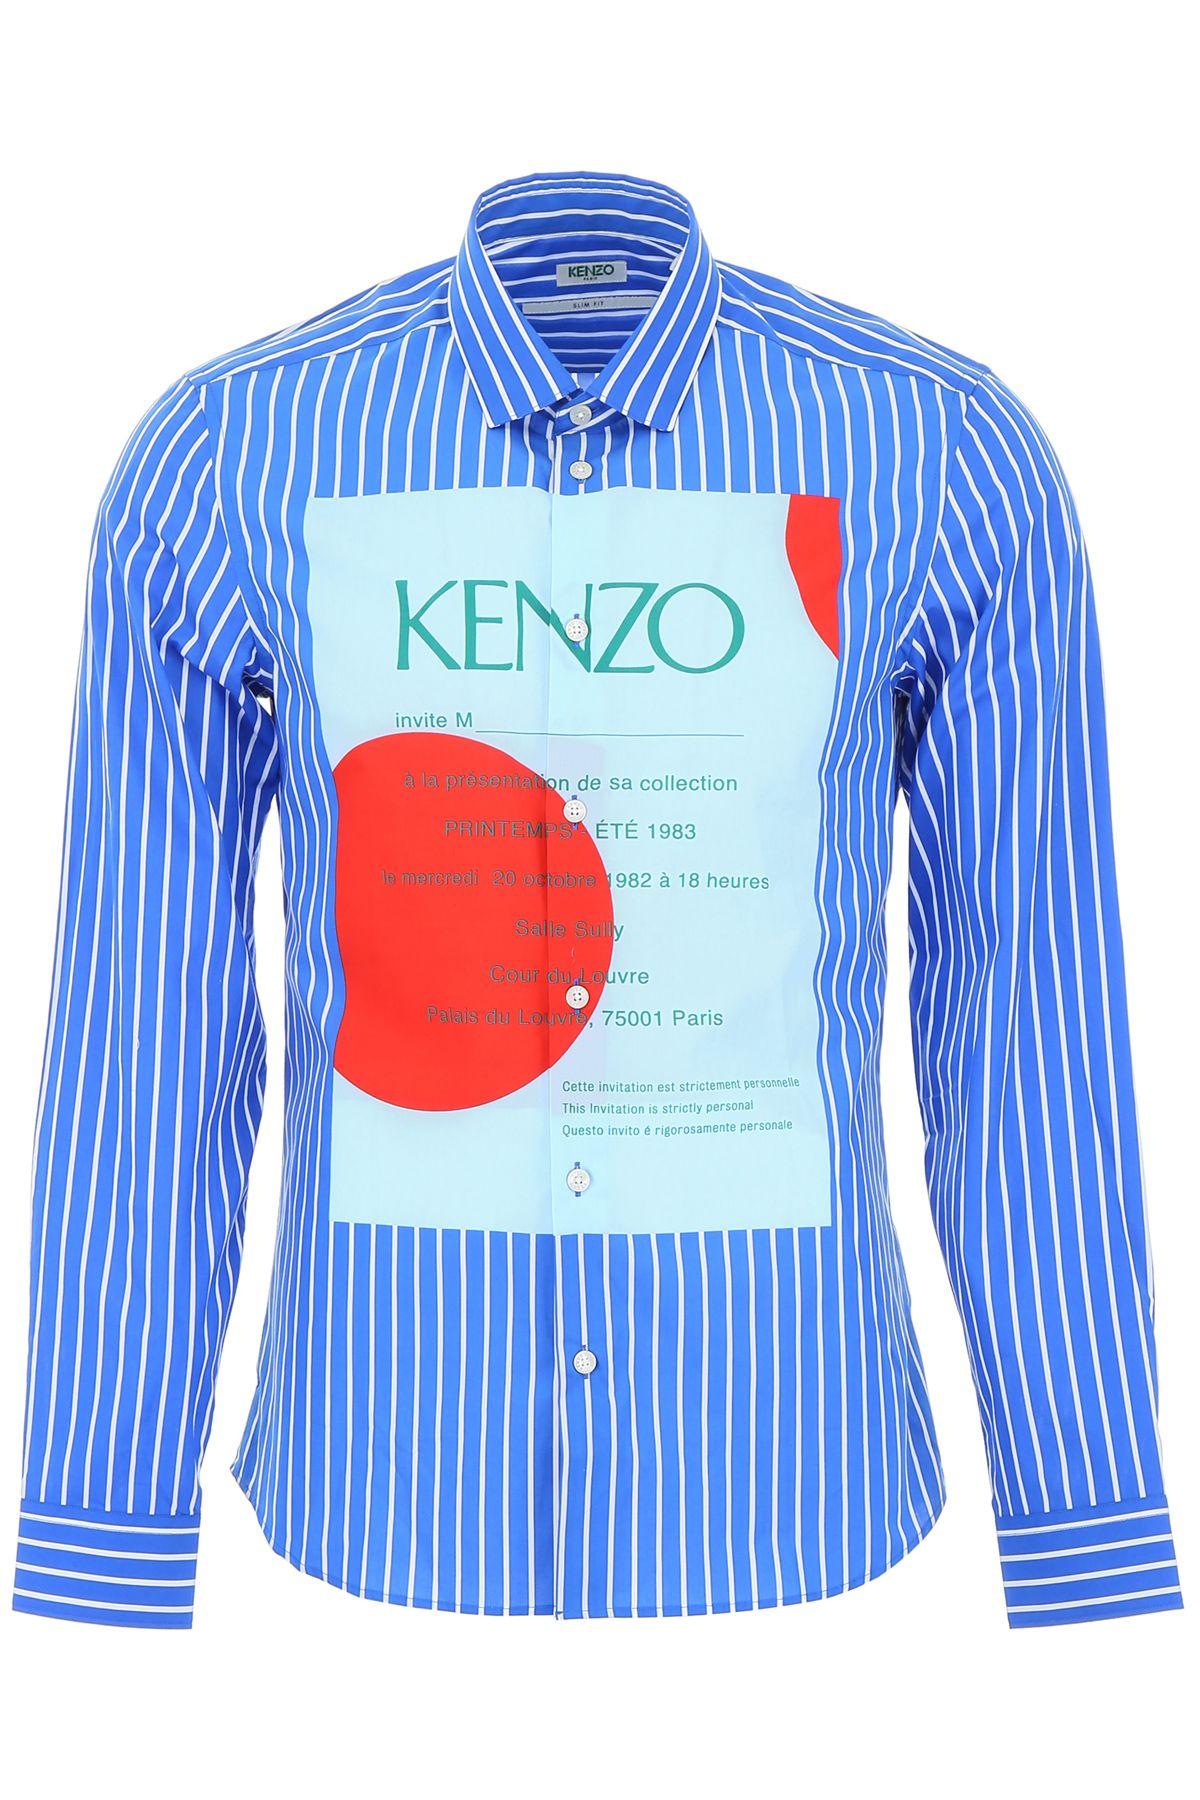 Kenzo Wedding Invitation Shirt